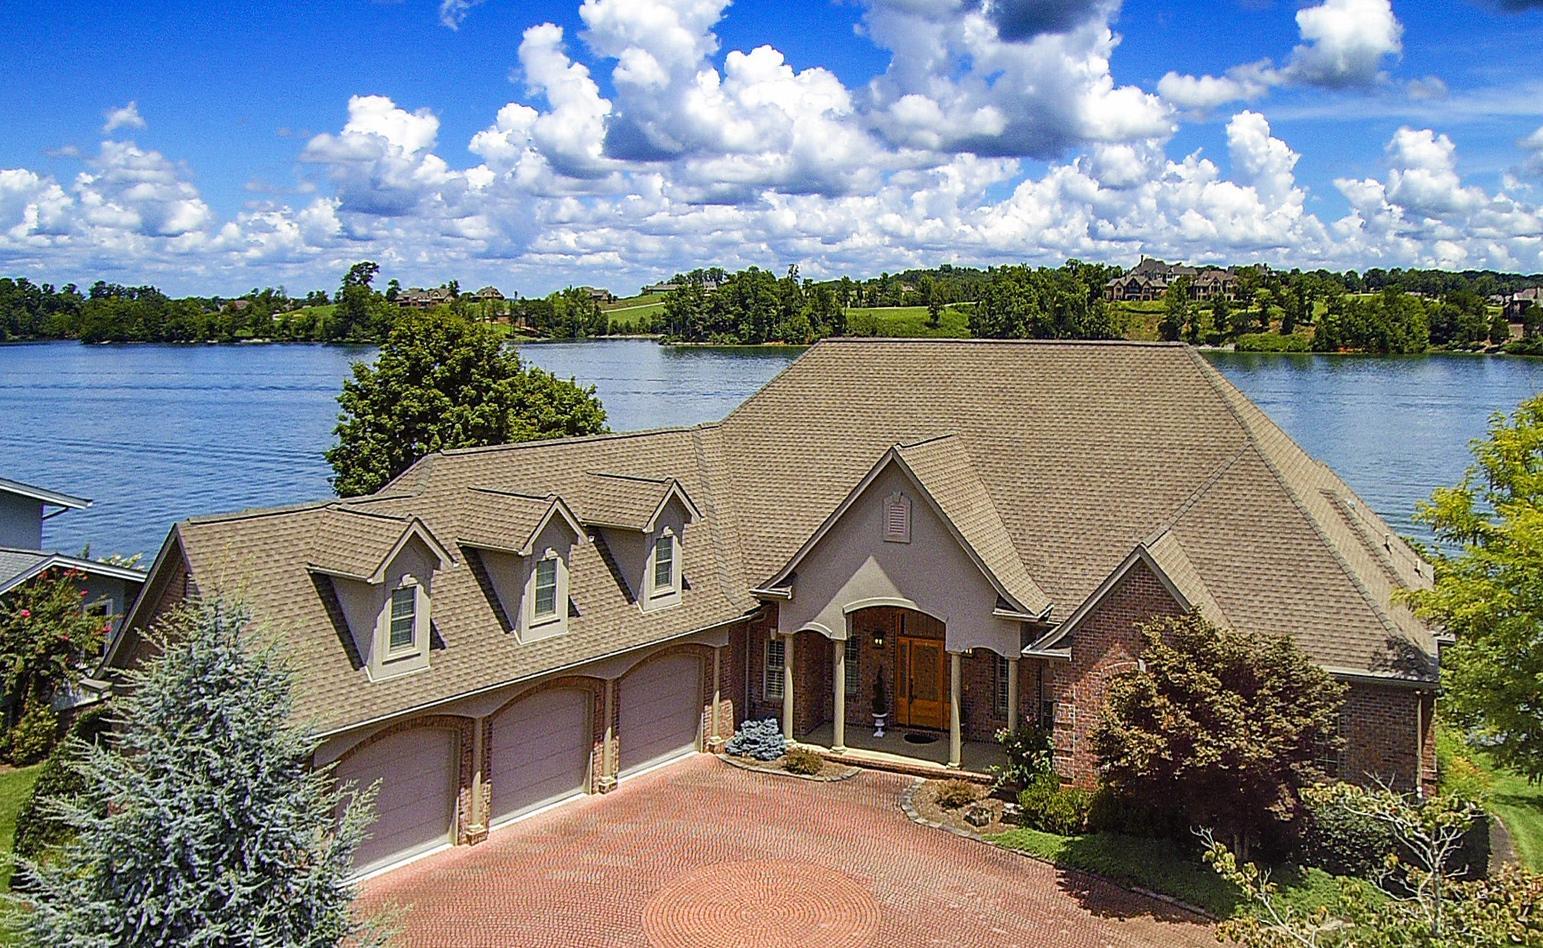 304 Seneca Tr, Loudon, Tennessee 37774, 4 Bedrooms Bedrooms, ,3 BathroomsBathrooms,Single Family,For Sale,Seneca,1051369